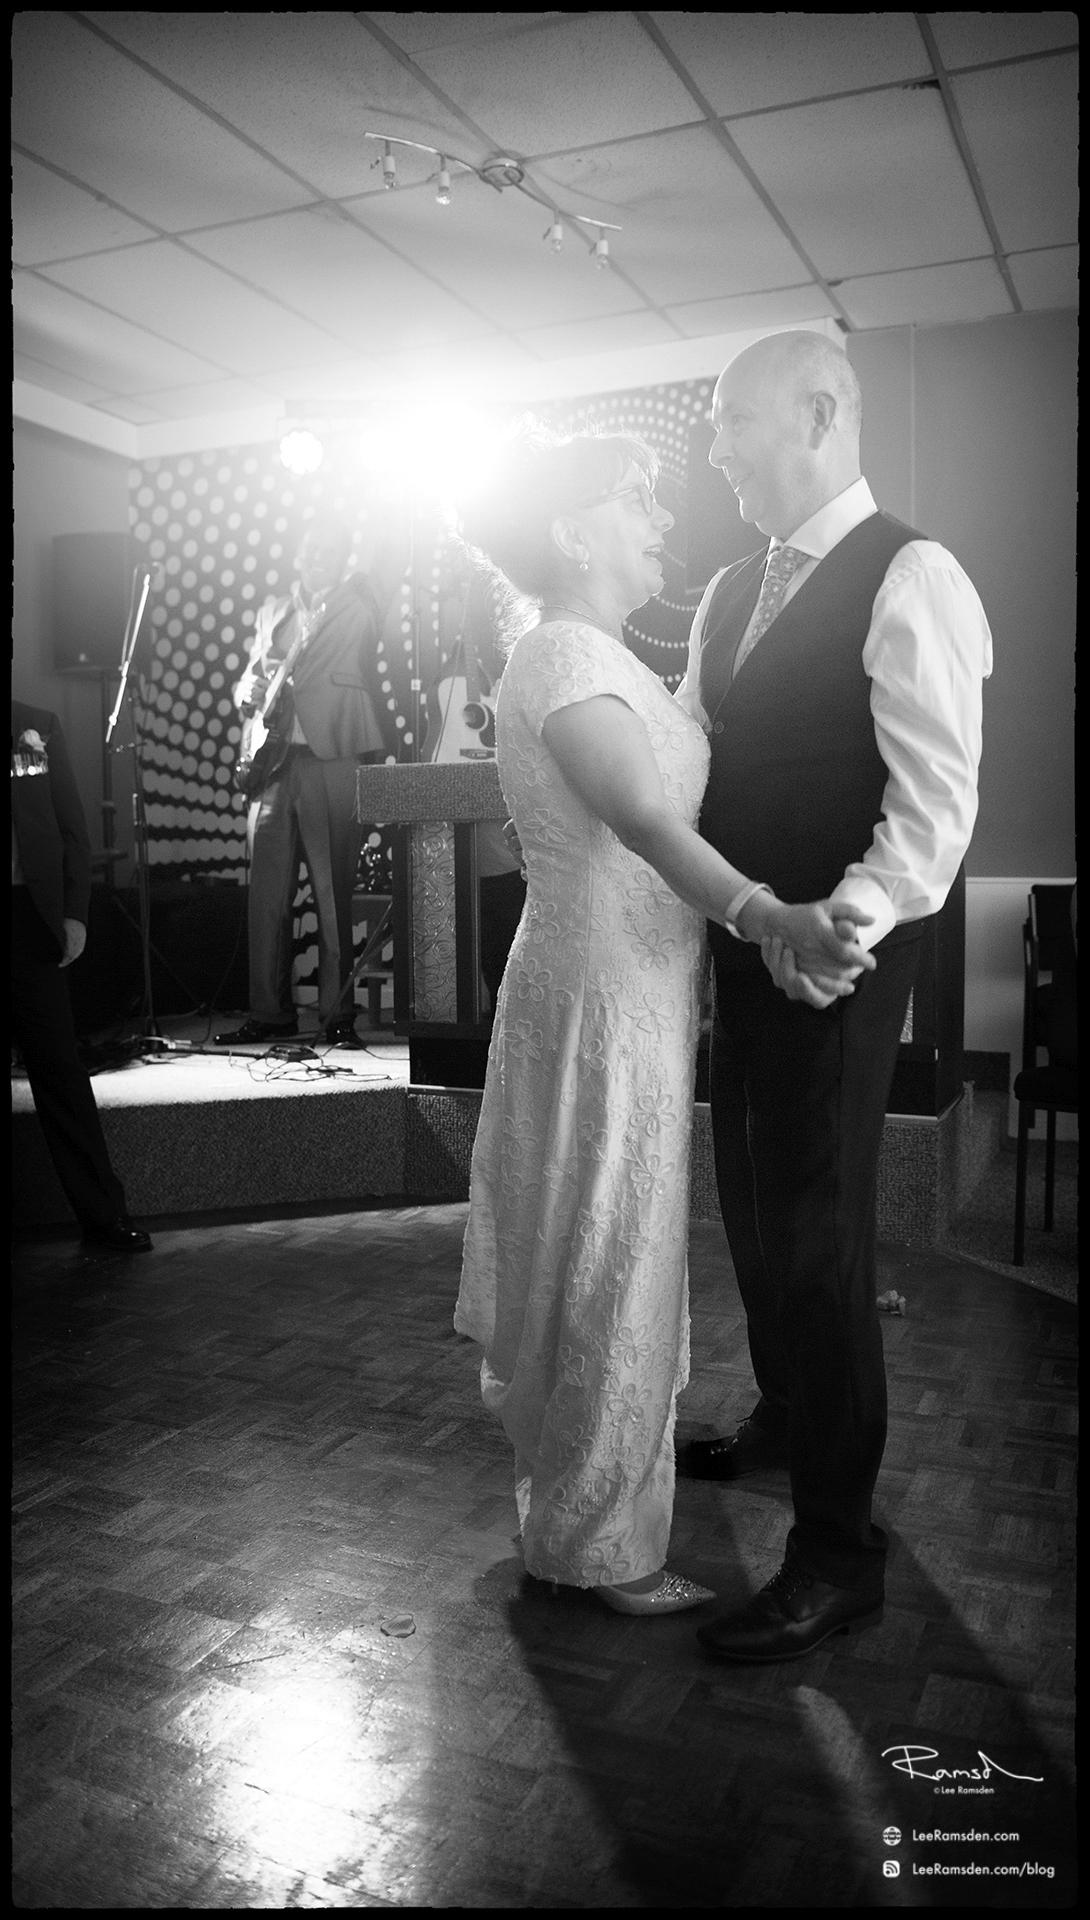 14 Lee Ramsden Wedding photography photographer Lancashire Lytham St Annes Ansdell Fylde reportage professional award winning www.leeramsden.com